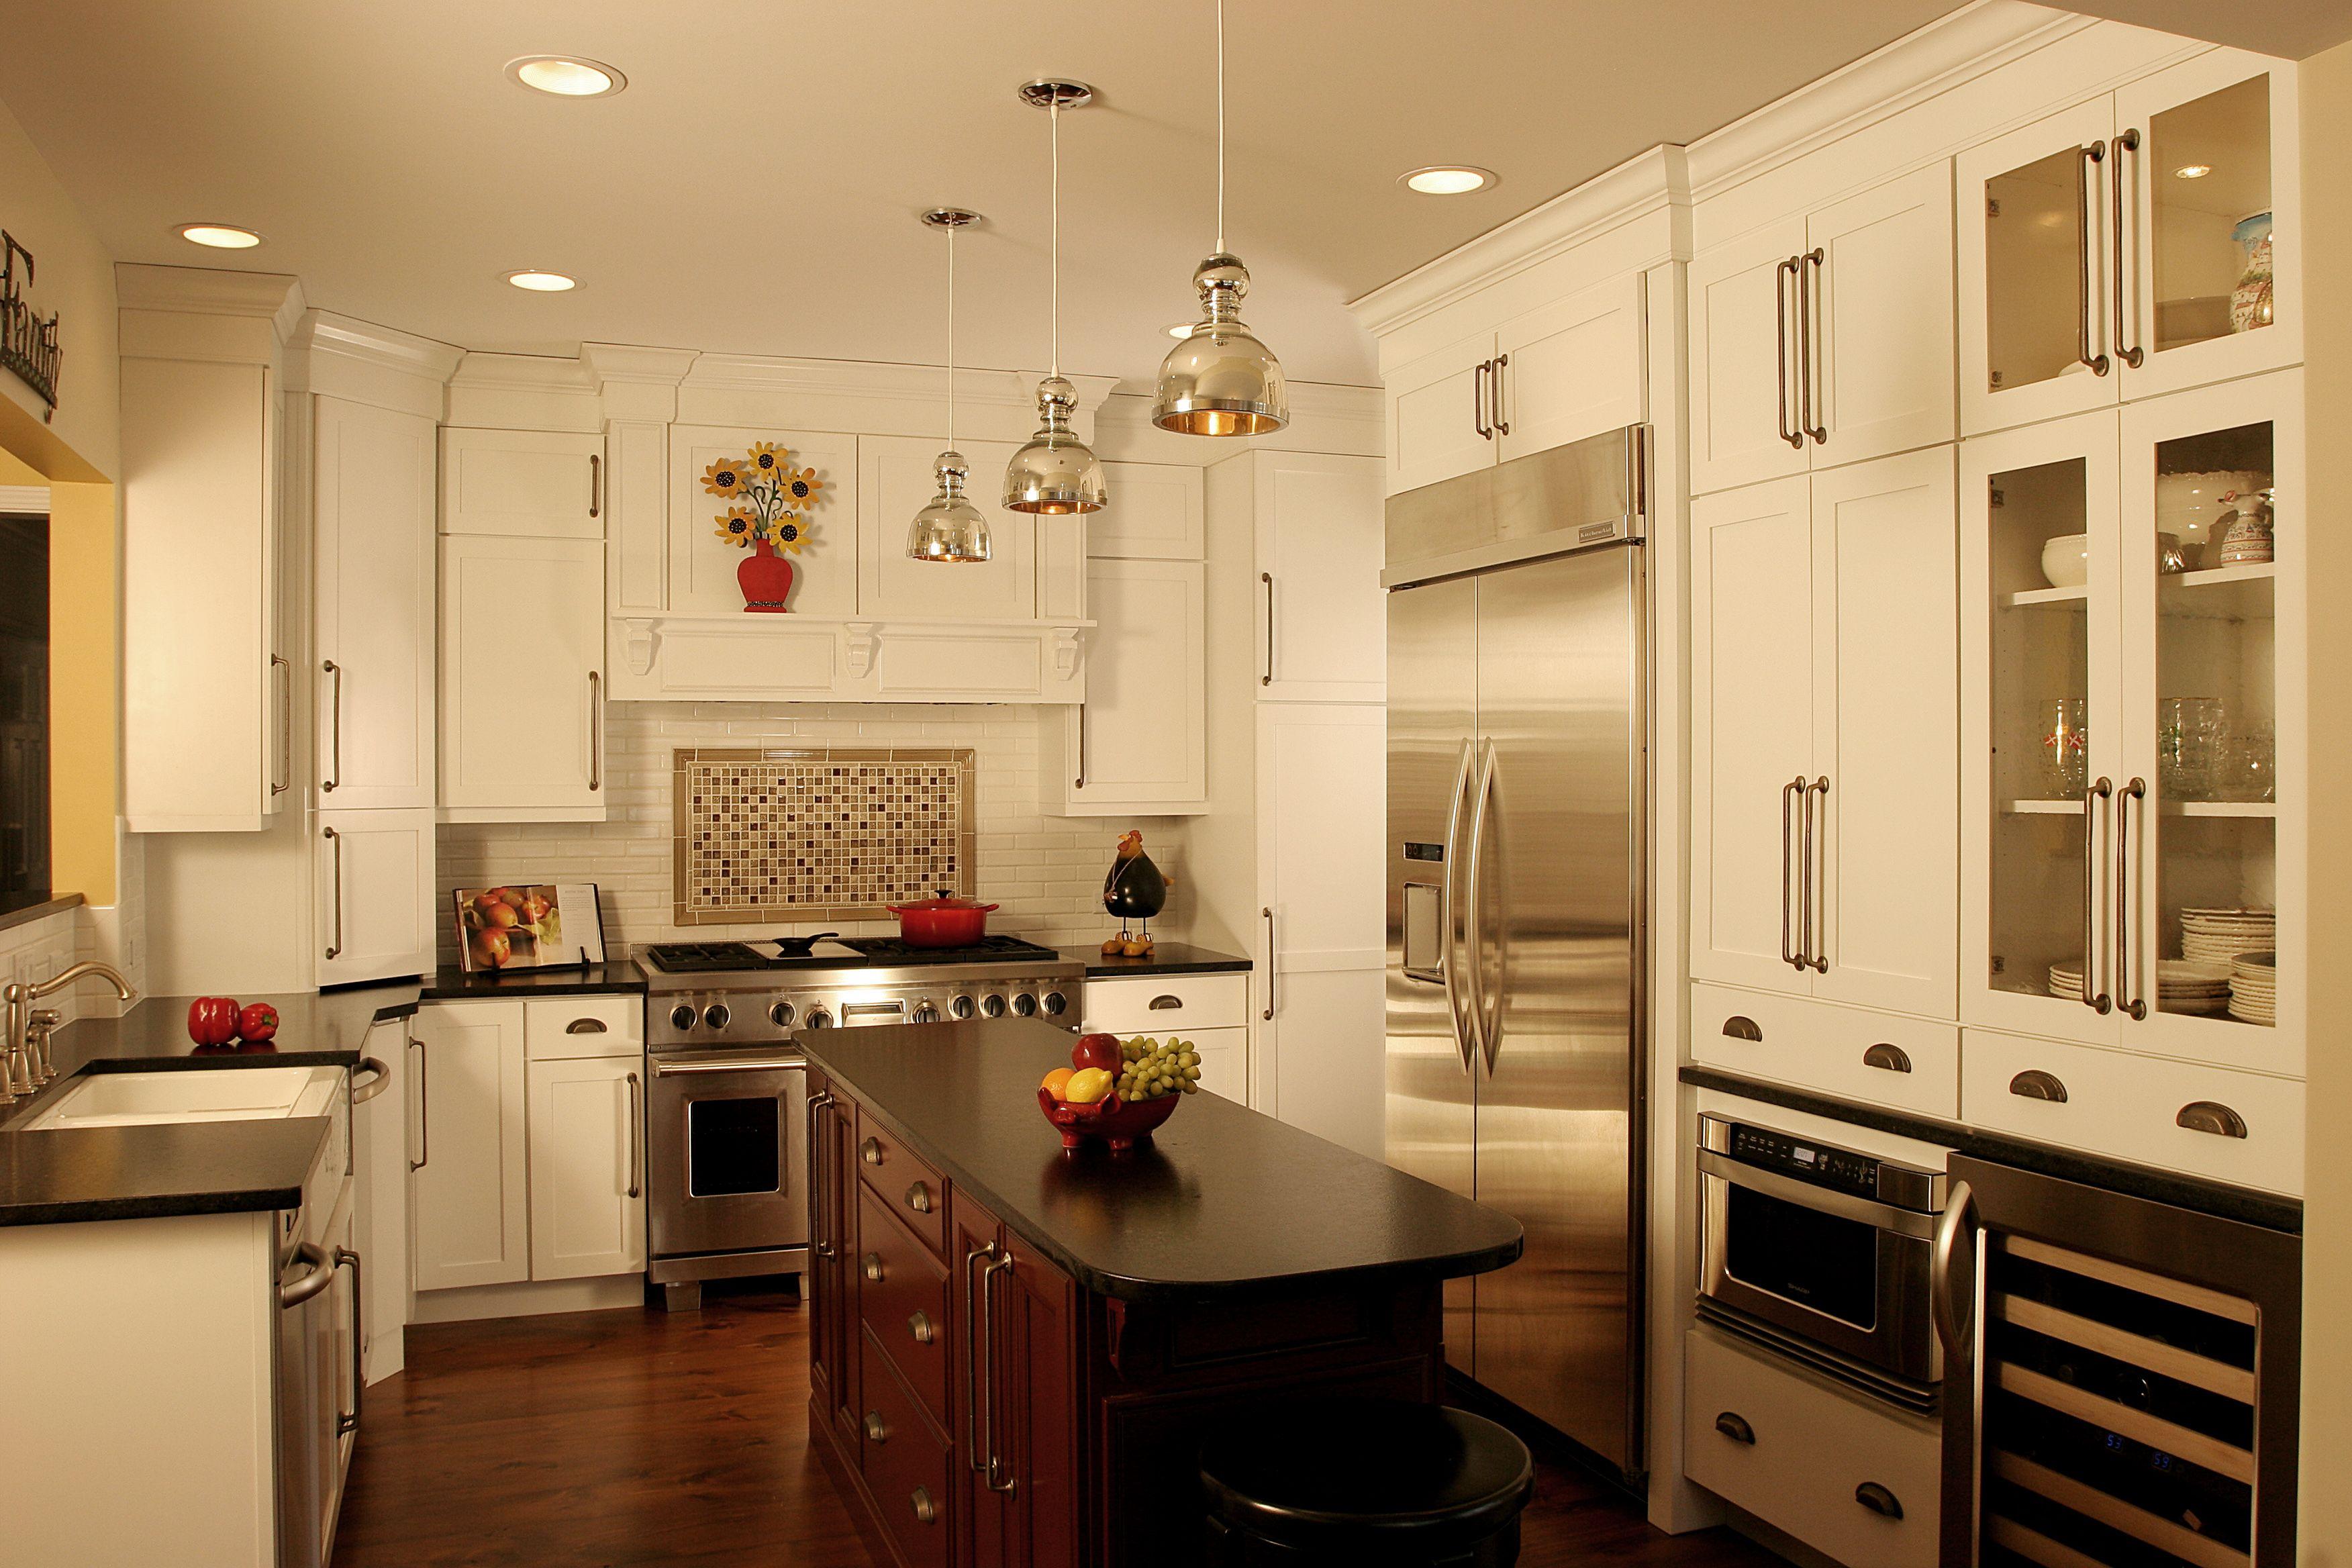 Arrangement Of Space General Location Of Microwave Modern Kitchen Design Kitchen Remodel Small Kitchen Island